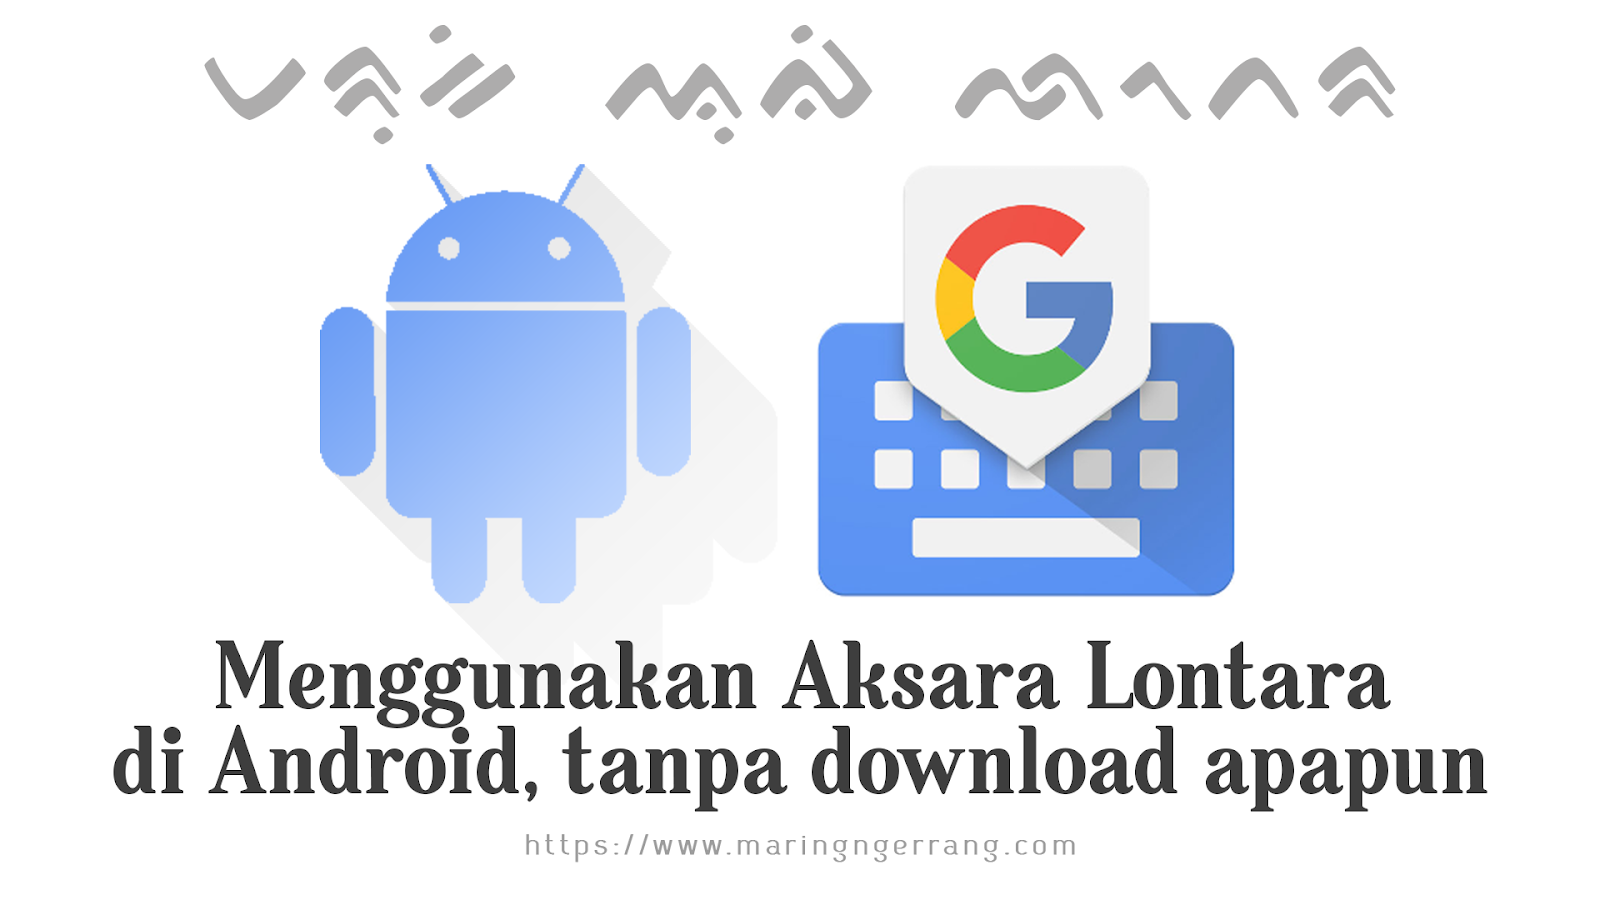 Menggunakan Font Lontara di Android Tanpa Aplikasi